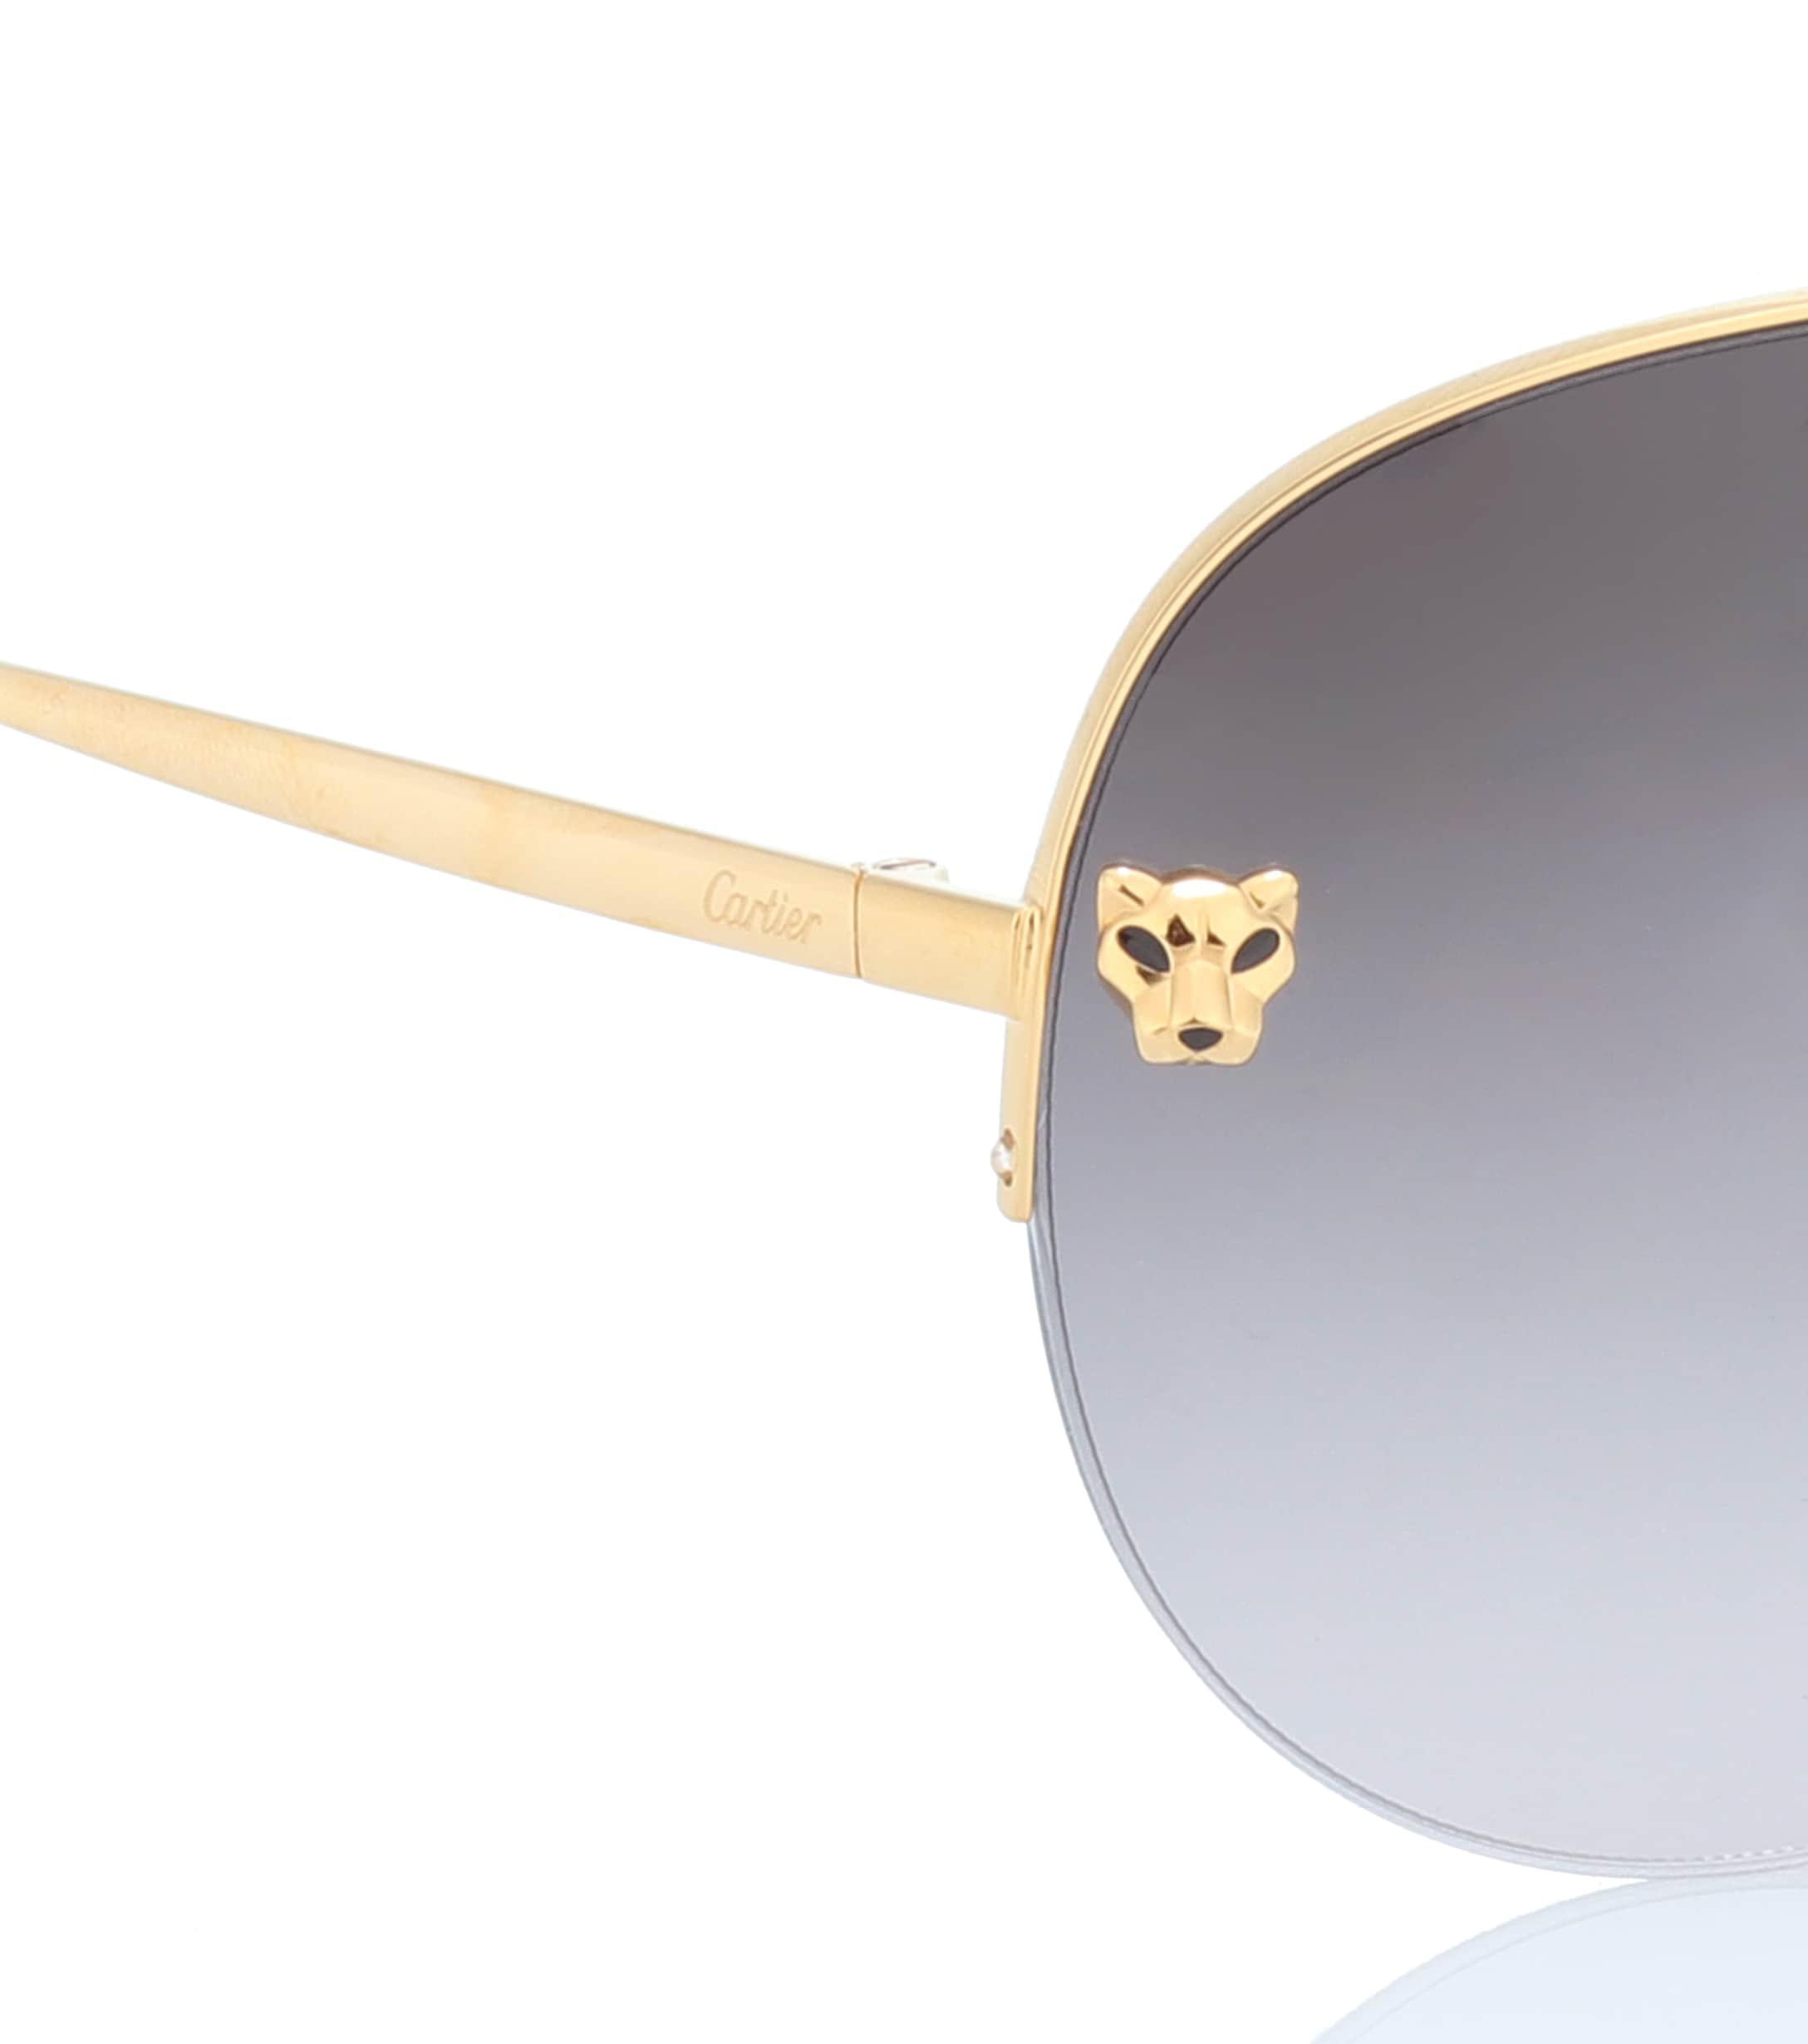 65c226b1f9 Lyst - Cartier Panthère De Cartier Aviator Sunglasses in Metallic